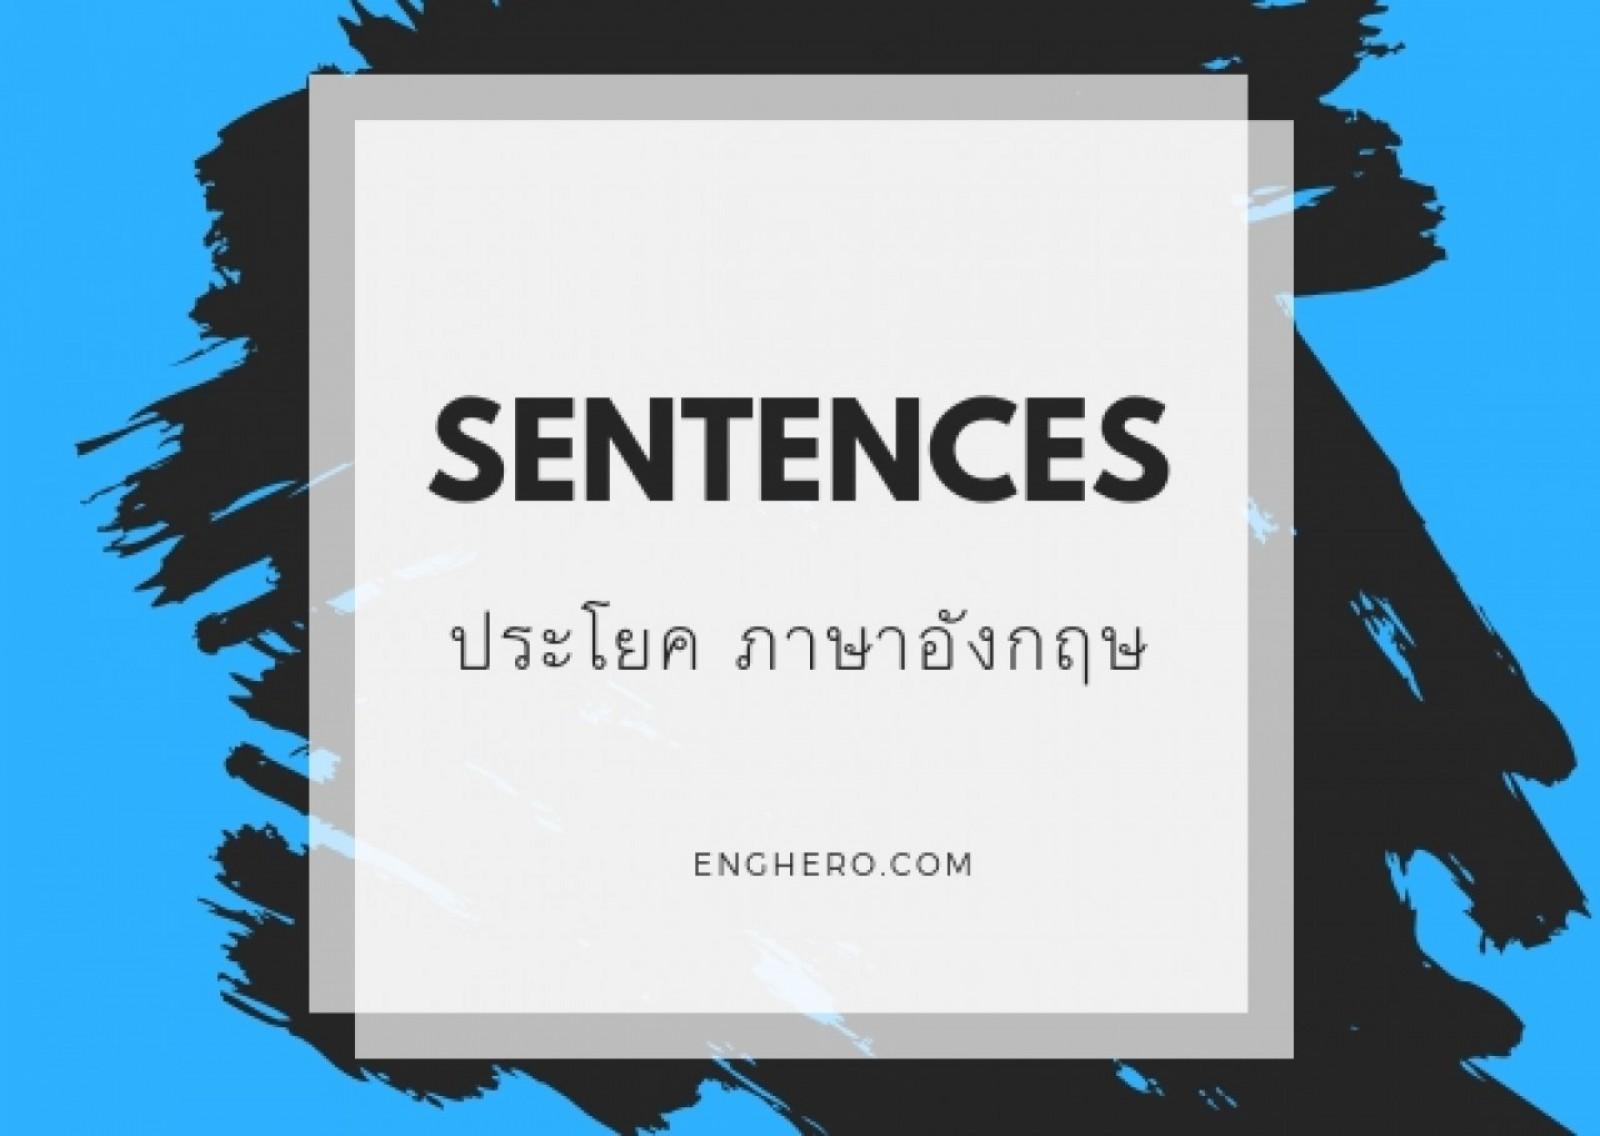 Sentences - ประโยค ภาษาอังกฤษ | Eng Hero เรียนภาษาอังกฤษ ออนไลน์ ฟรี